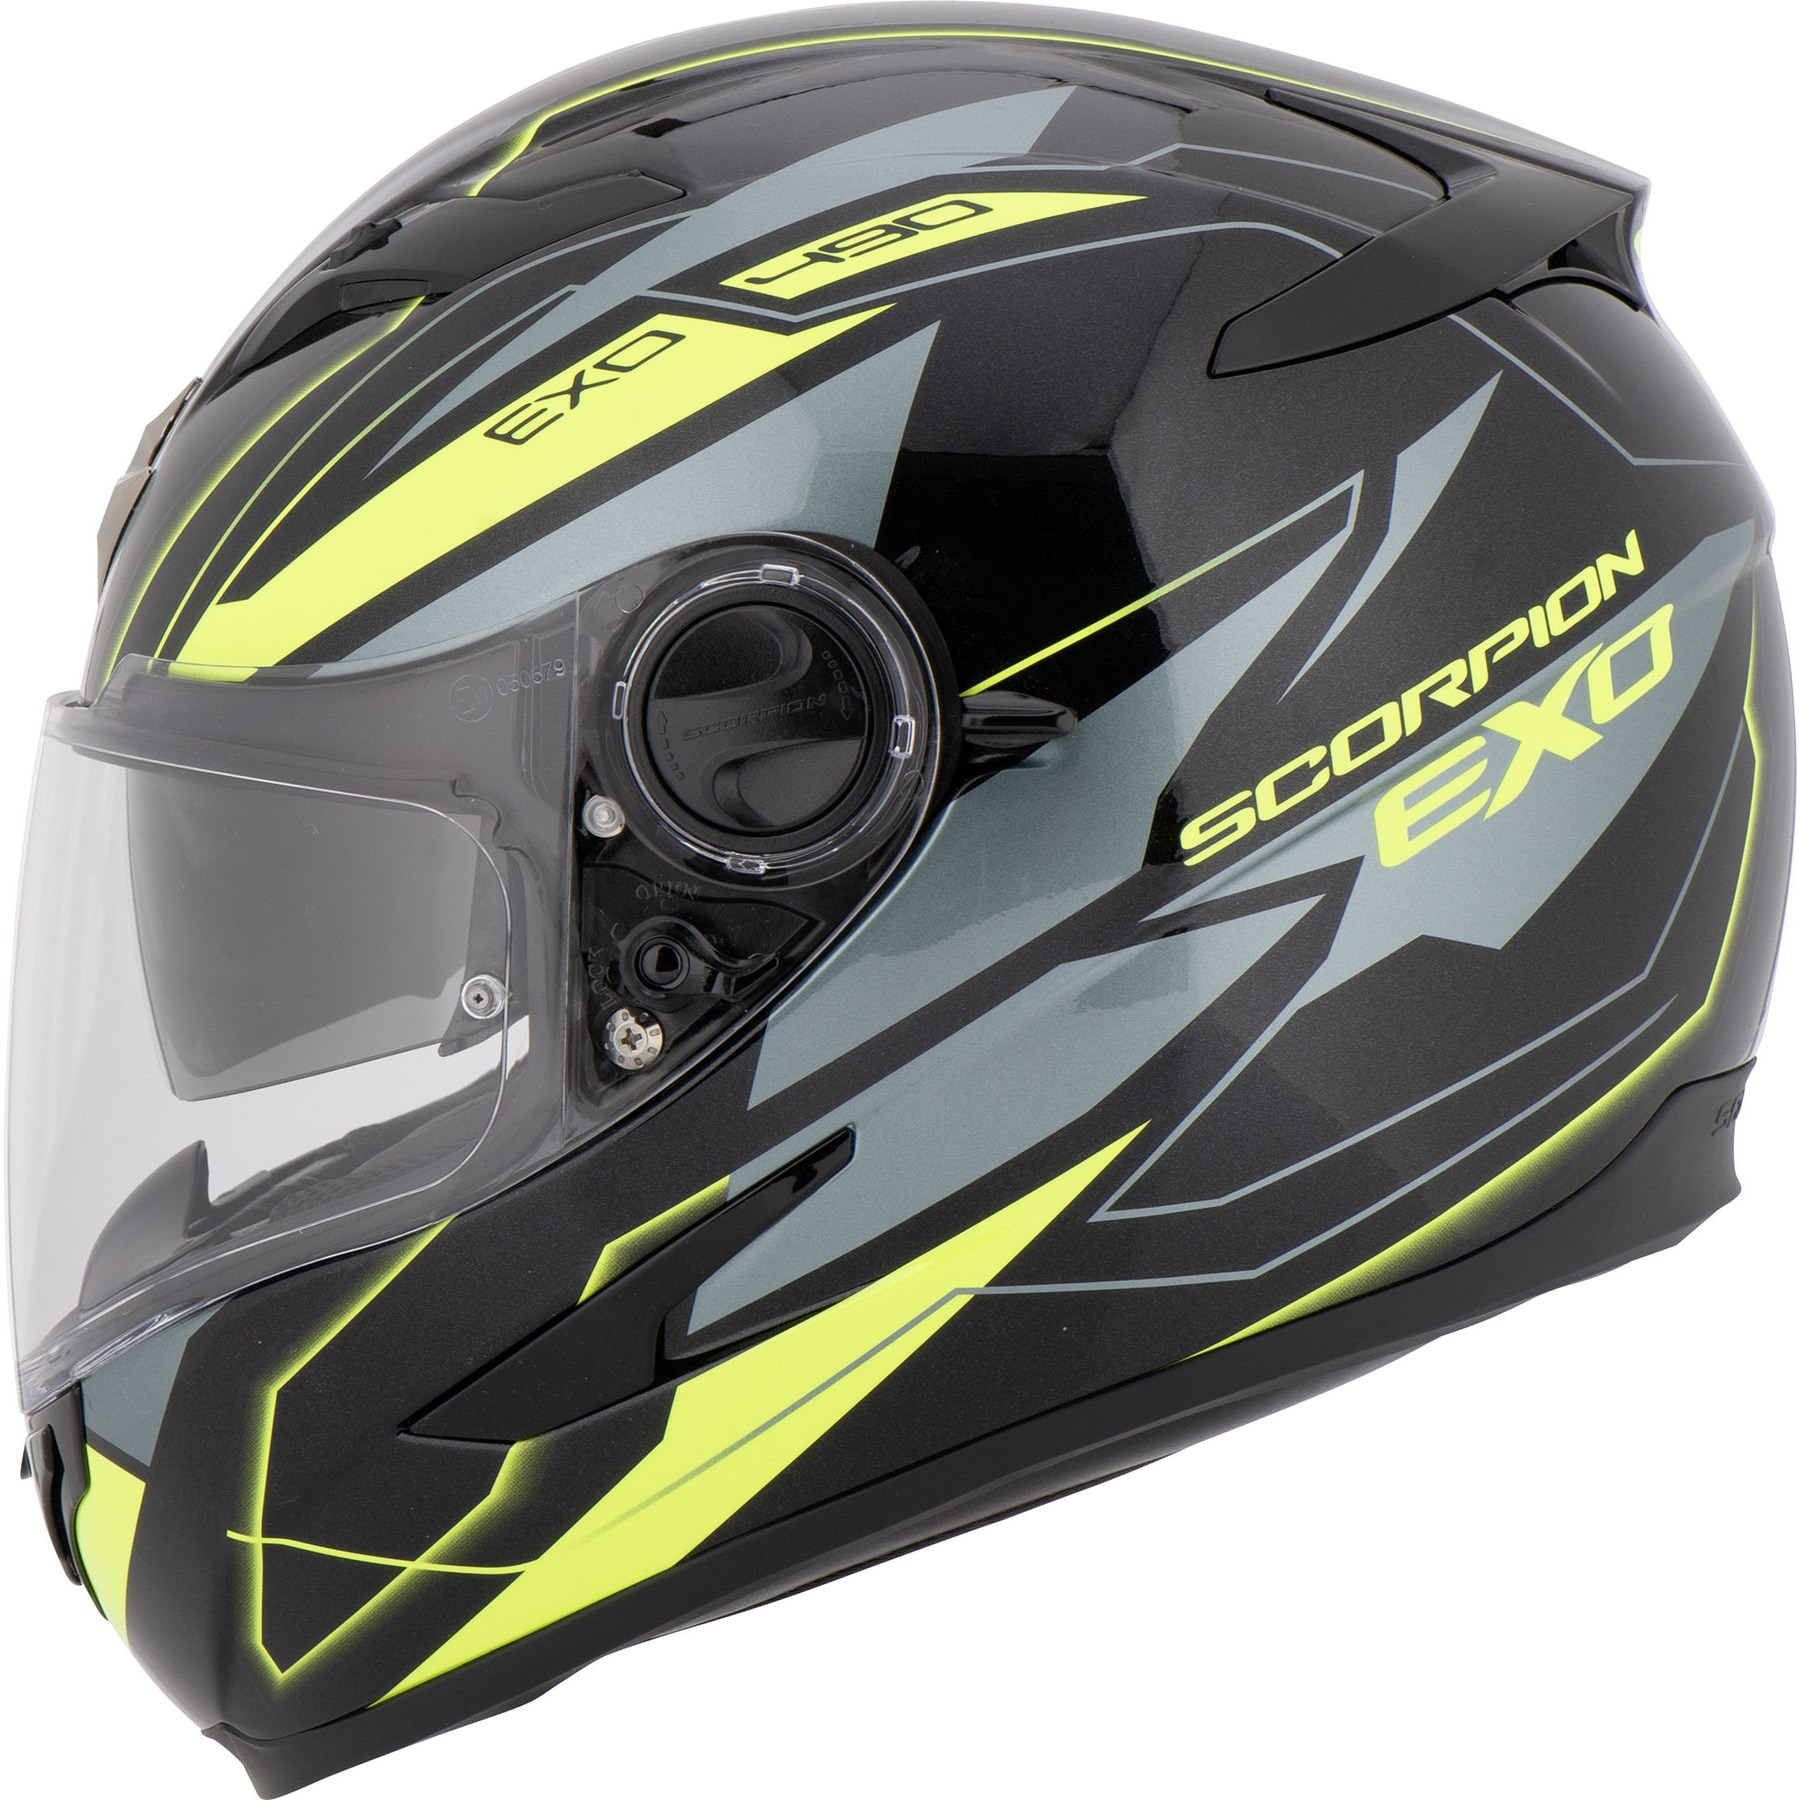 Open Face Jet Helmet Motorbike Scooter Long Visor Fluo Yellow L